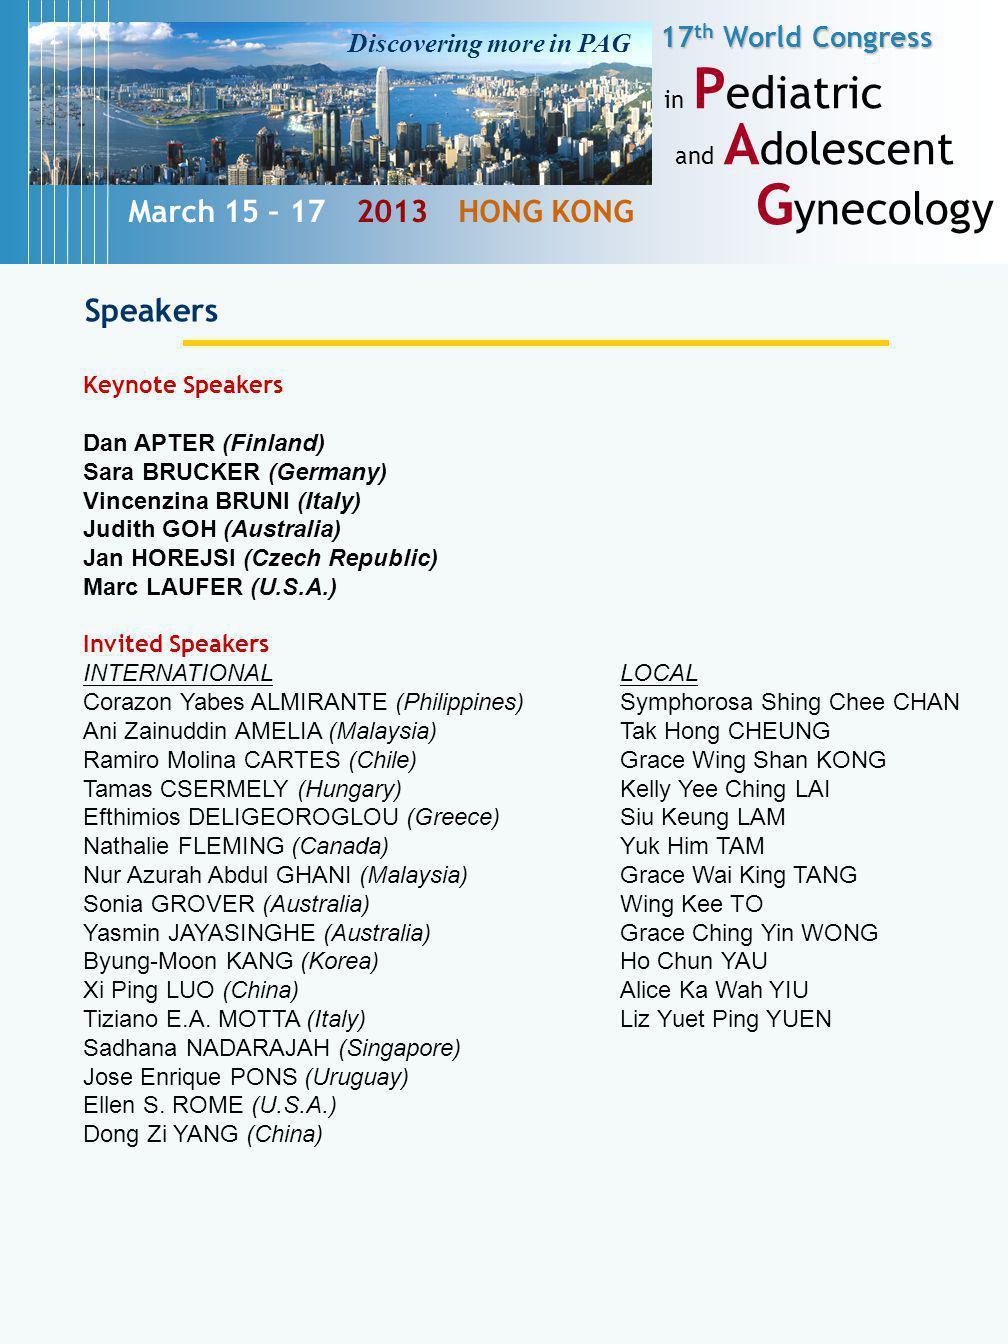 17 th World Congress in P ediatric and A dolescent G ynecology March 15 – 17 2013 HONG KONG Speakers Keynote Speakers Dan APTER (Finland) Sara BRUCKER (Germany) Vincenzina BRUNI (Italy) Judith GOH (Australia) Jan HOREJSI (Czech Republic) Marc LAUFER (U.S.A.) Invited Speakers INTERNATIONALLOCAL Corazon Yabes ALMIRANTE (Philippines)Symphorosa Shing Chee CHAN Ani Zainuddin AMELIA (Malaysia)Tak Hong CHEUNG Ramiro Molina CARTES (Chile)Grace Wing Shan KONG Tamas CSERMELY (Hungary)Kelly Yee Ching LAI Efthimios DELIGEOROGLOU (Greece)Siu Keung LAM Nathalie FLEMING (Canada)Yuk Him TAM Nur Azurah Abdul GHANI (Malaysia)Grace Wai King TANG Sonia GROVER (Australia)Wing Kee TO Yasmin JAYASINGHE (Australia)Grace Ching Yin WONG Byung-Moon KANG (Korea)Ho Chun YAU Xi Ping LUO (China)Alice Ka Wah YIU Tiziano E.A.